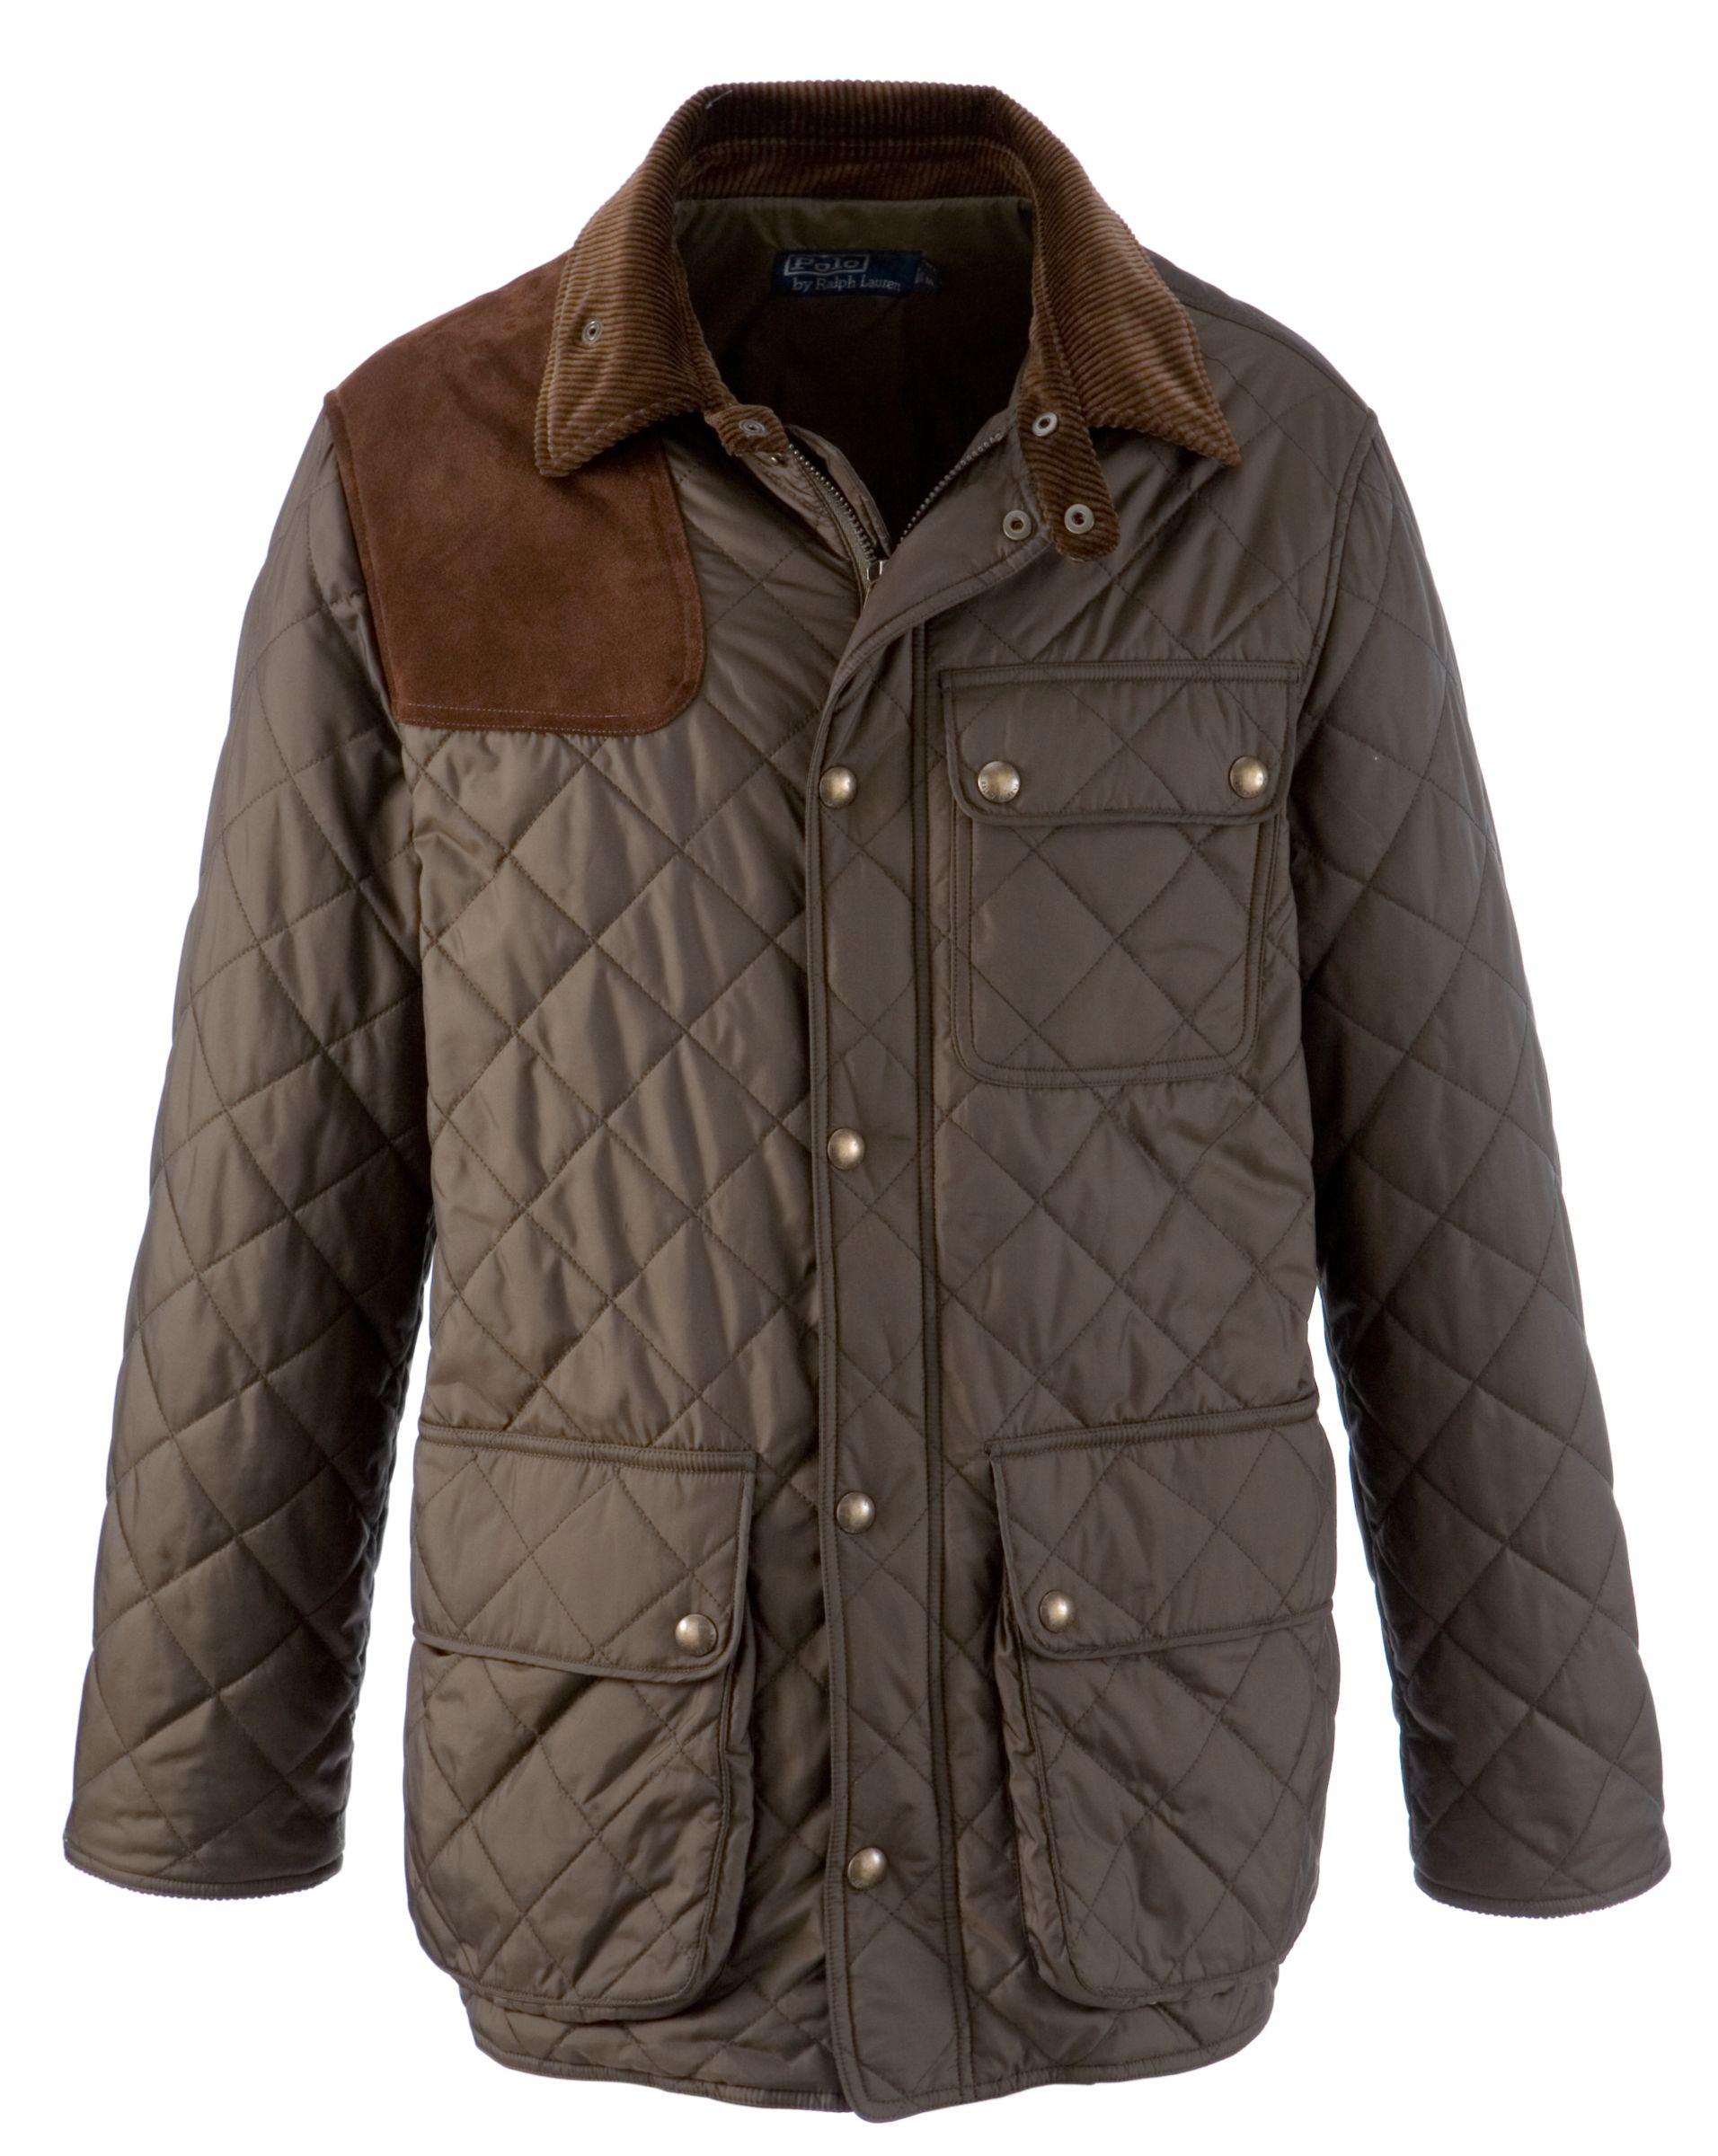 Polo Ralph Lauren Kempton Quilted Jacket, Dark Green at John Lewis